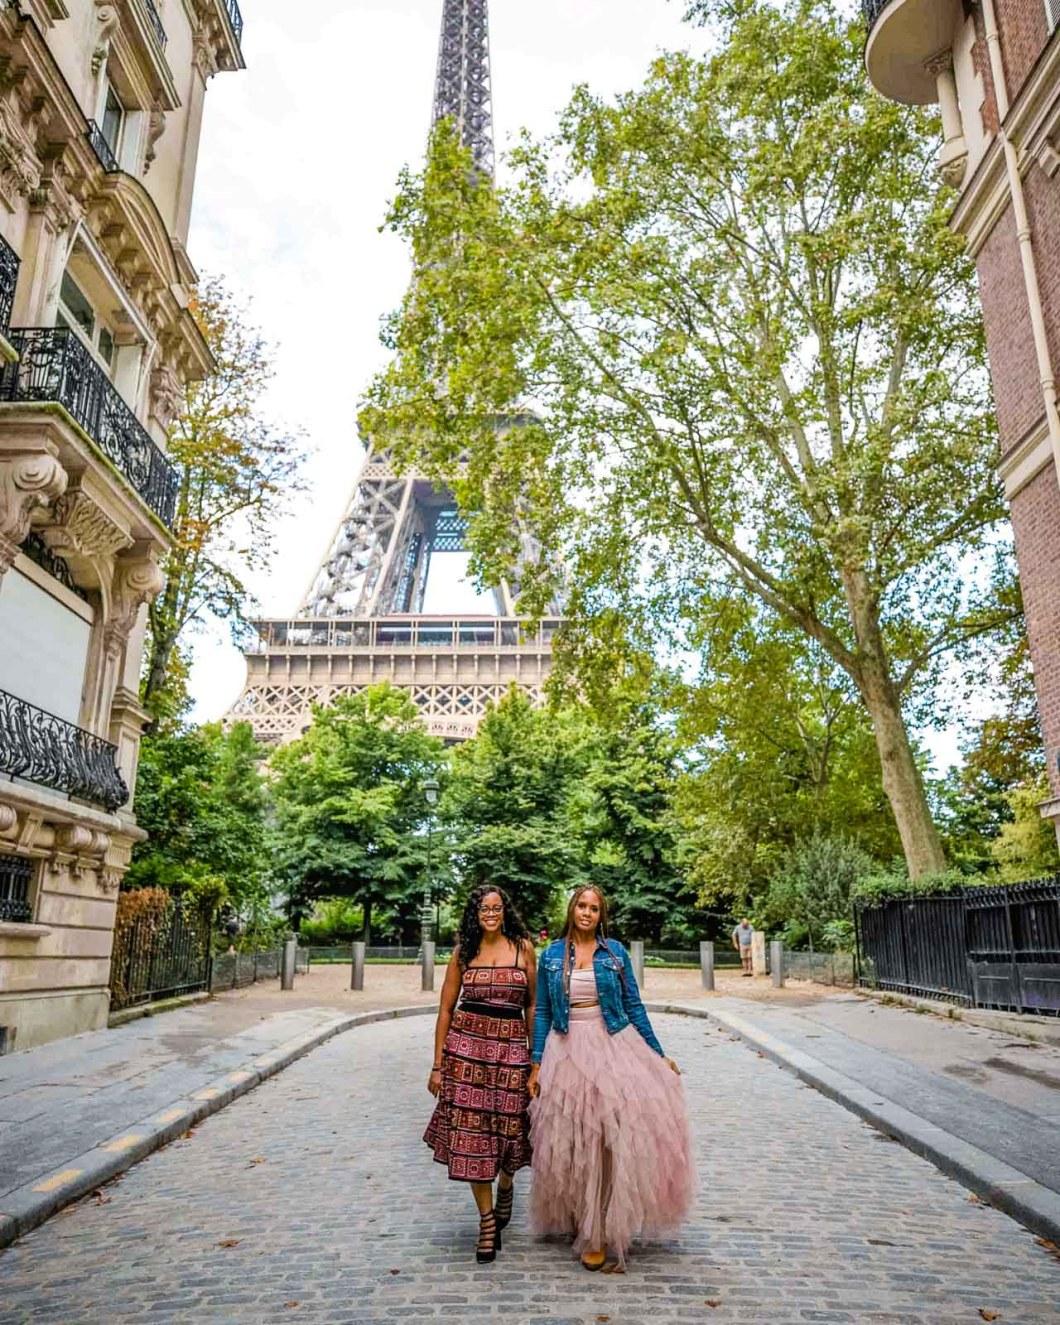 Photoshoot in Rue de l'Université with the Eiffel Tower